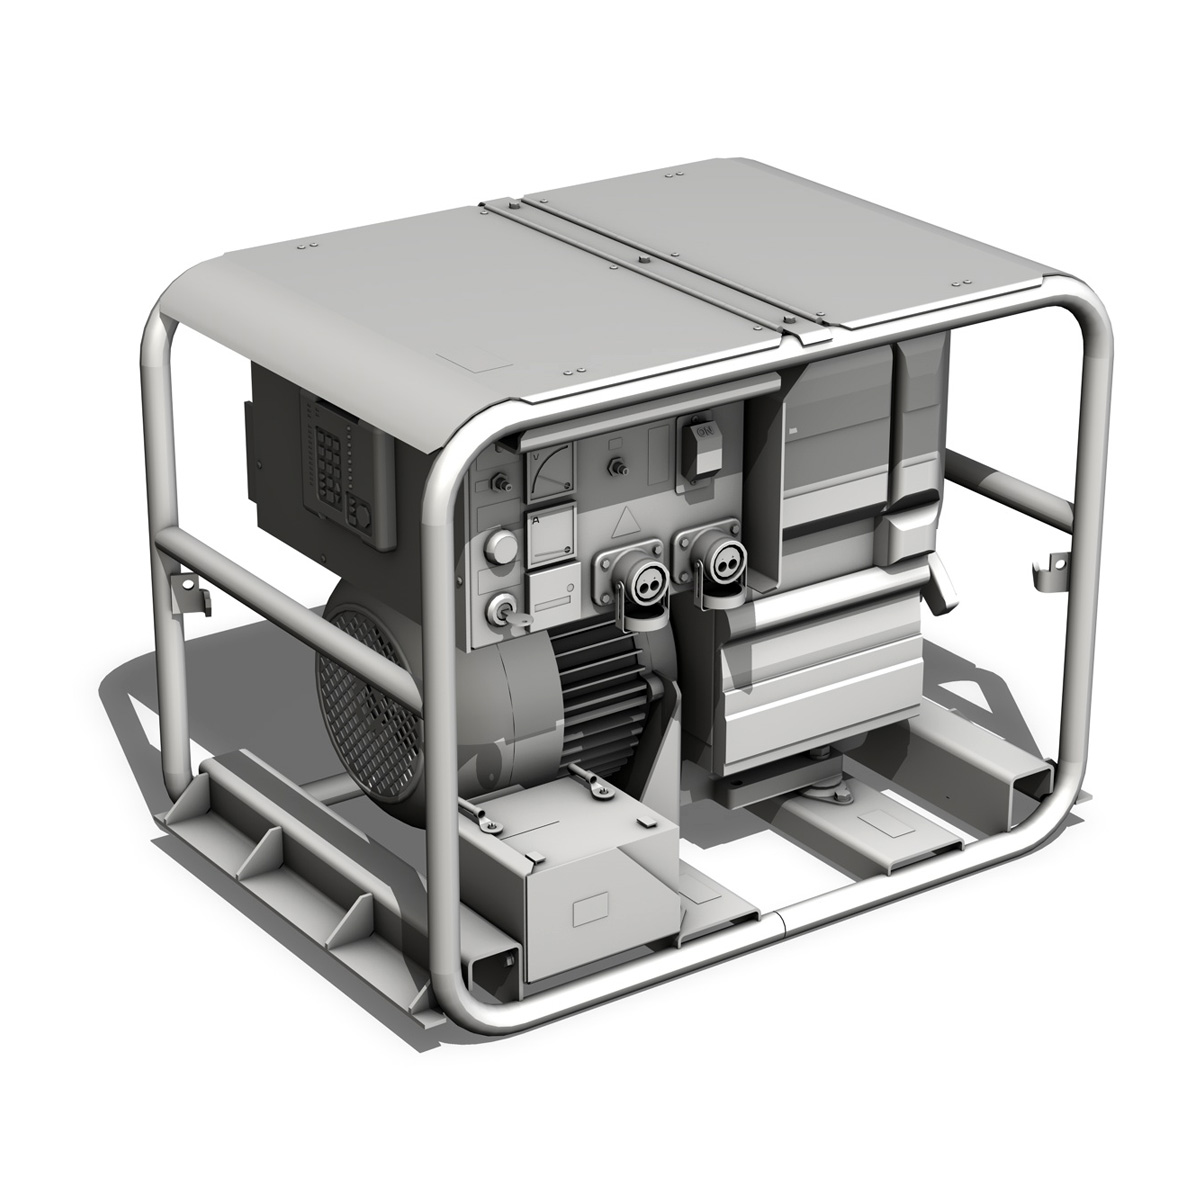 diesel generator 3d model 3ds fbx c4d lwo obj 188593